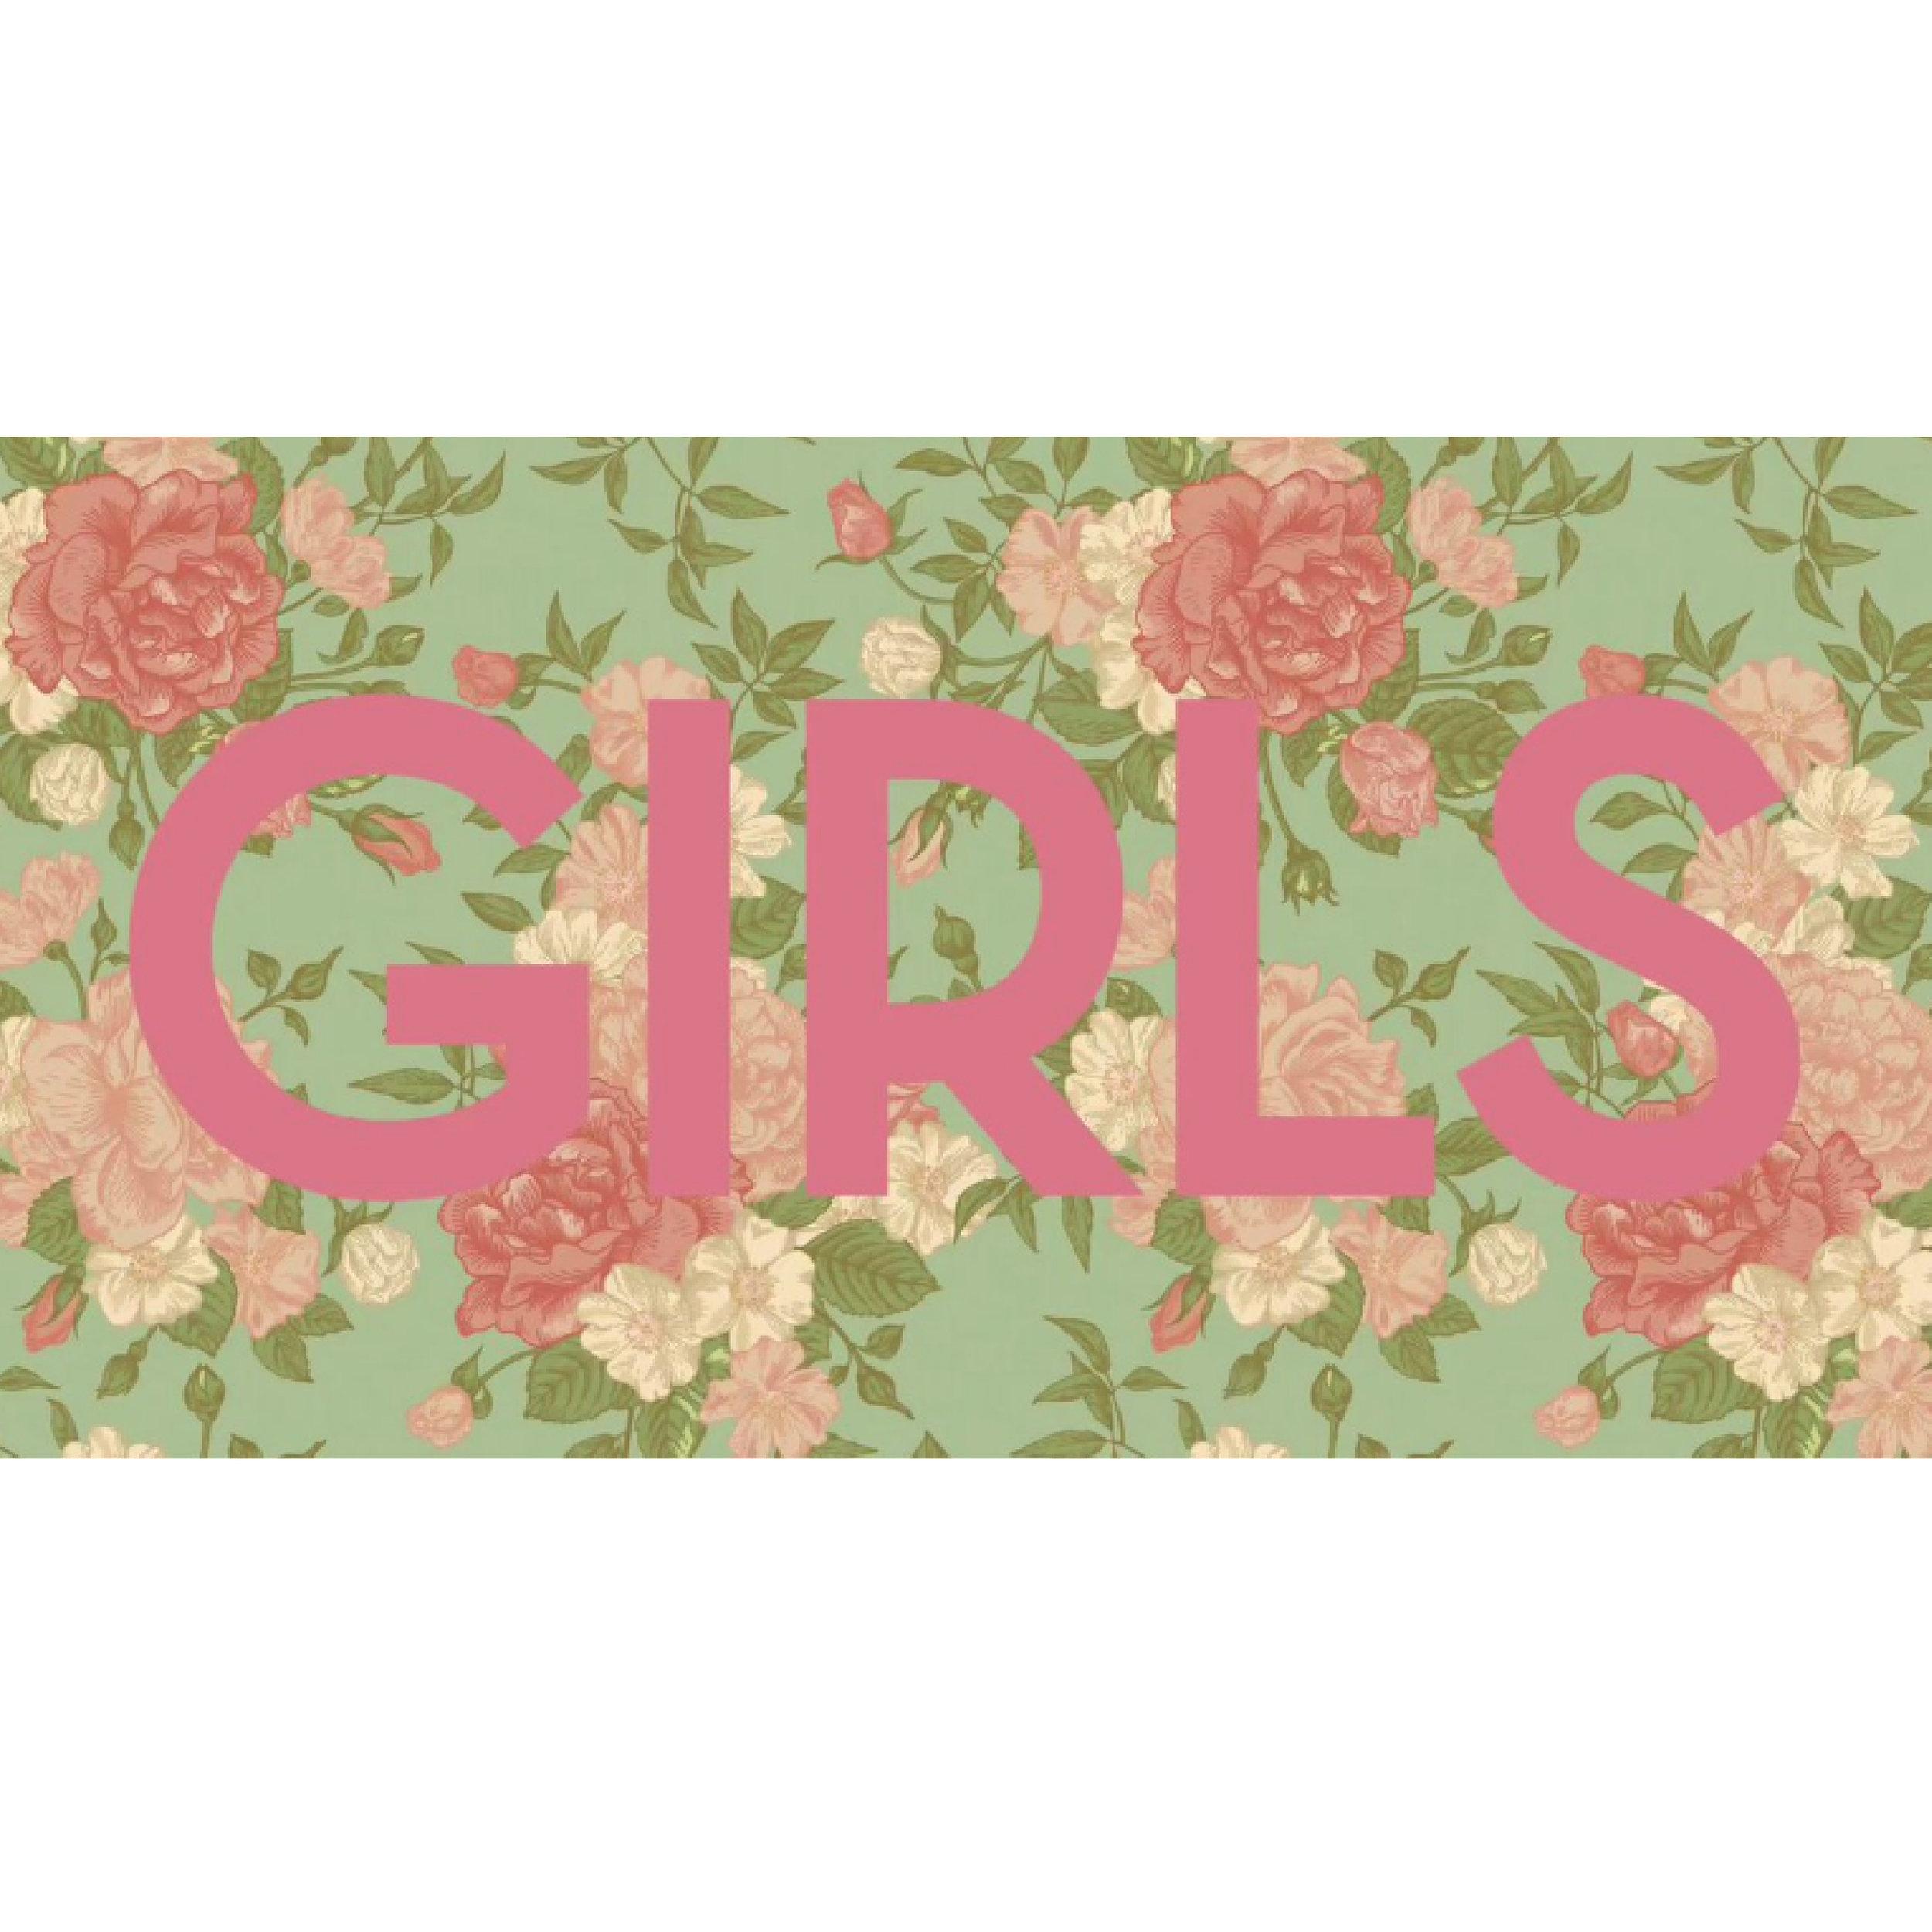 GIRLS HBO title screen